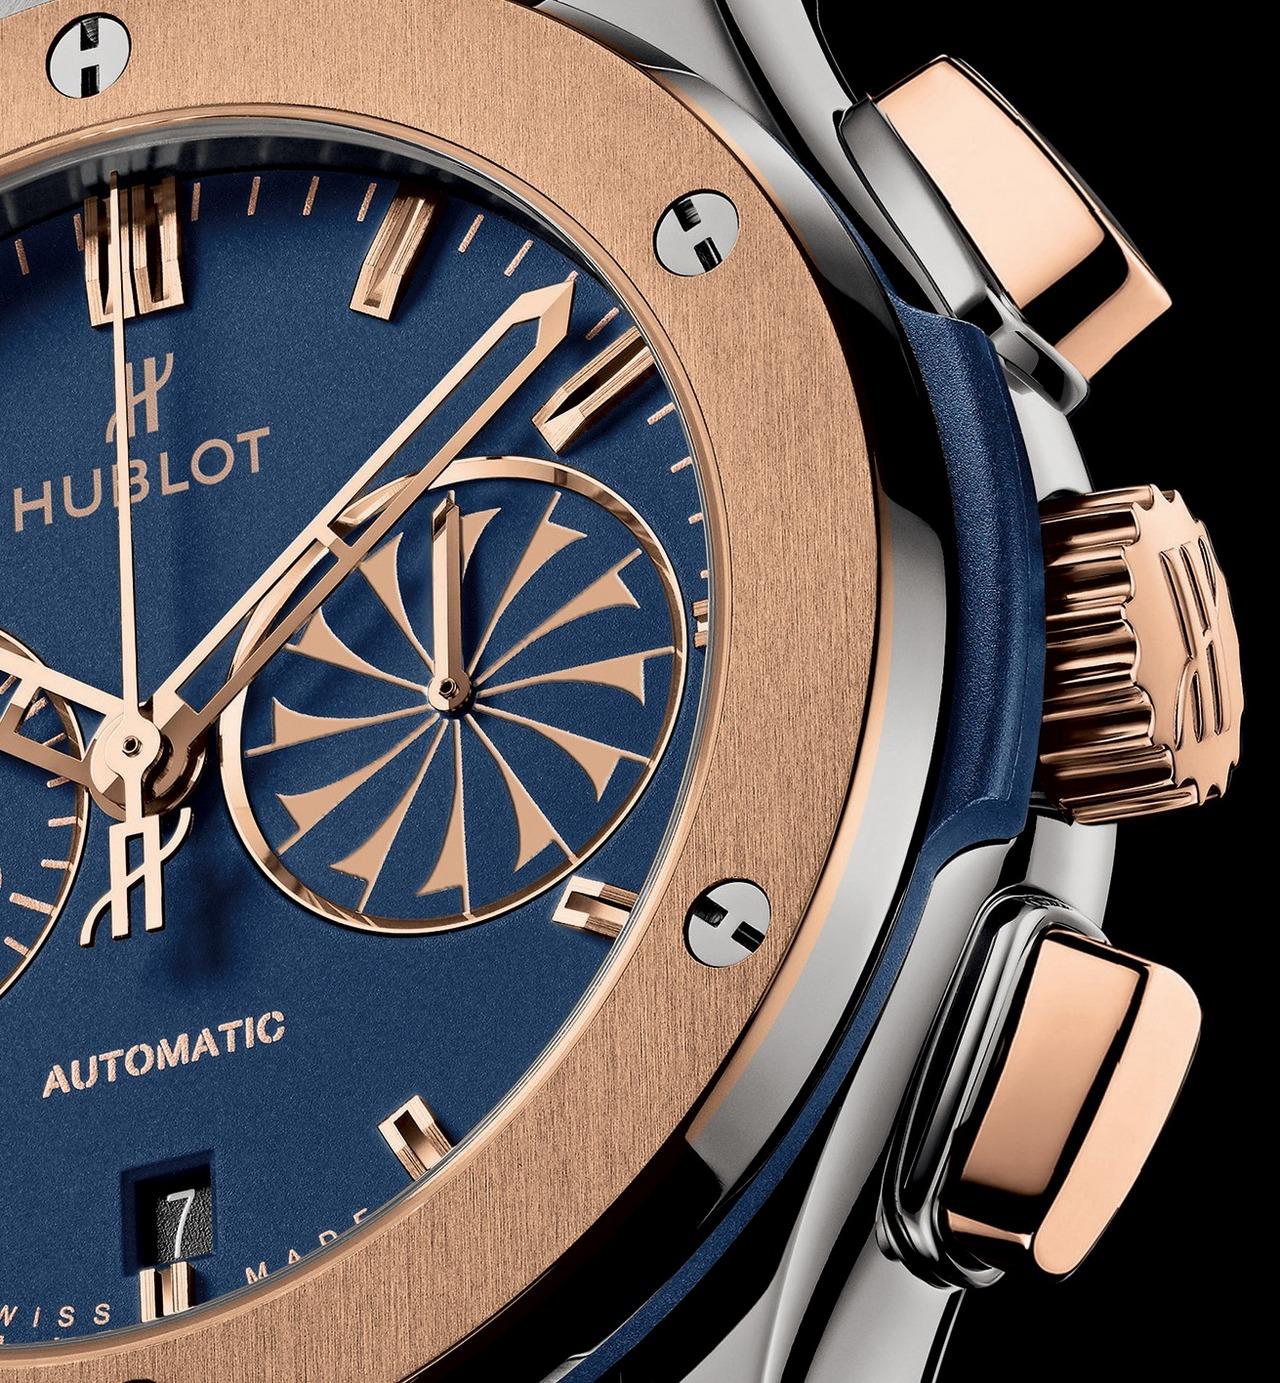 hublot-cronografo-classic-fusion-mykonos-2013_0-100_4